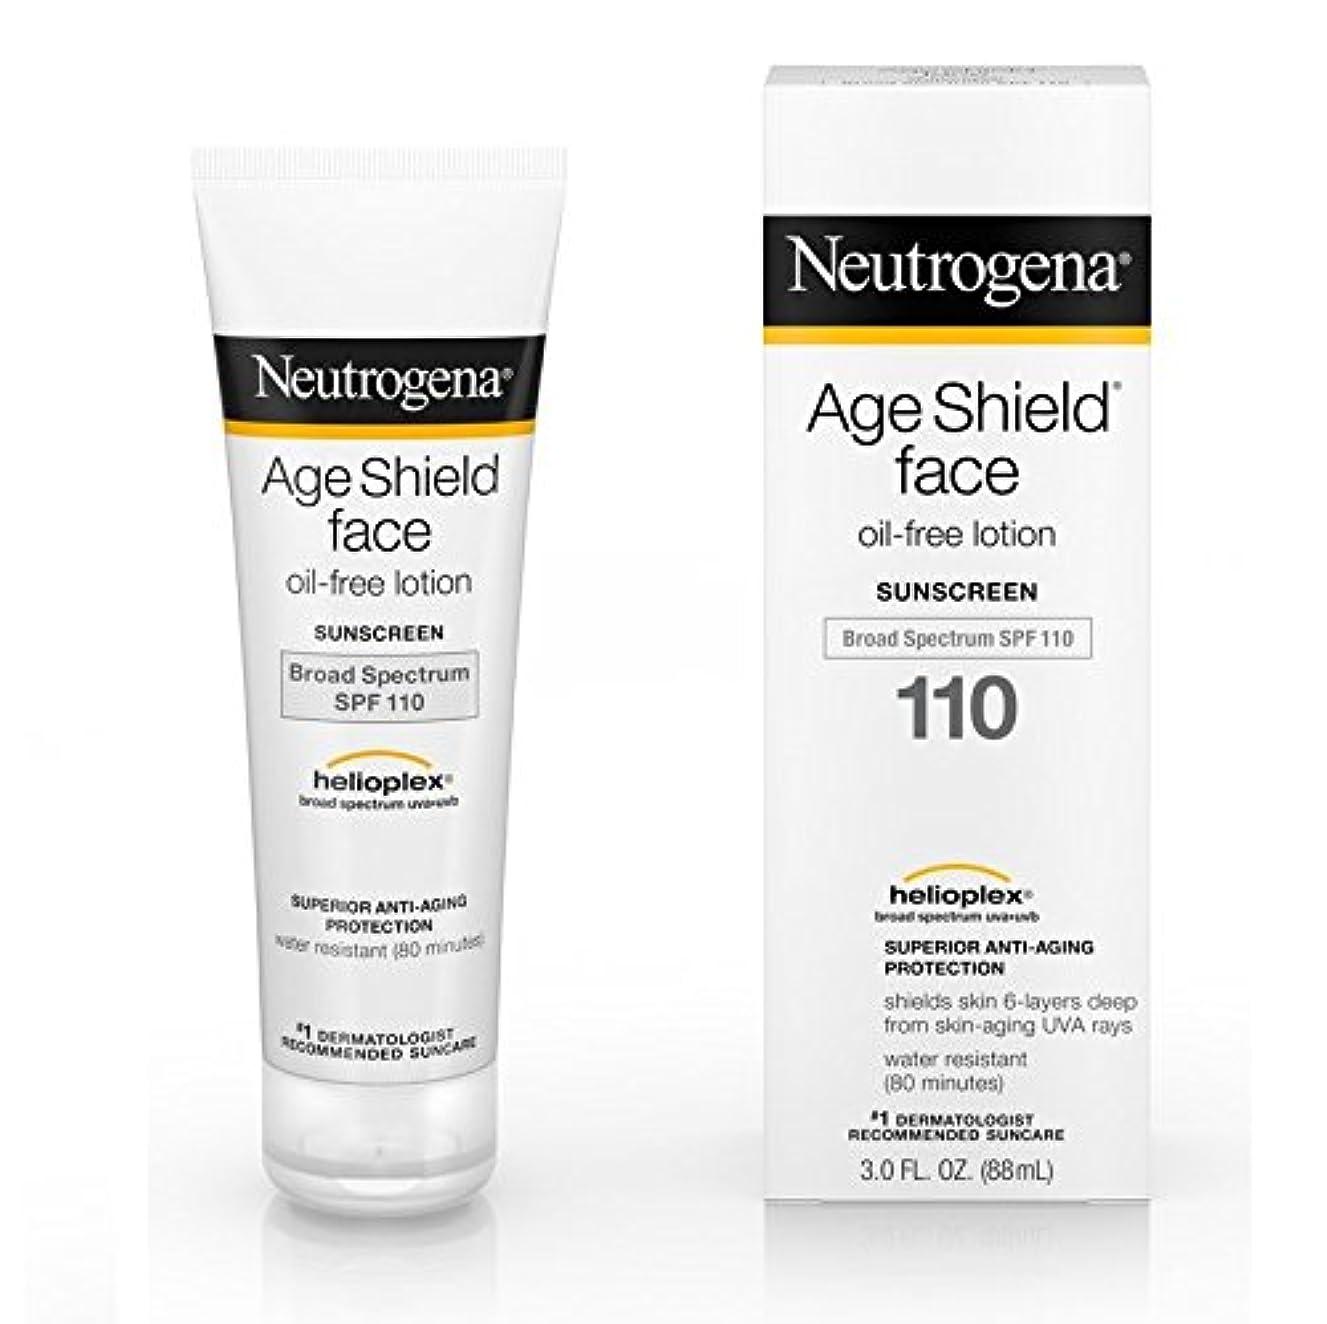 【海外直送品】Neutrogena Age Shield® Face Oil-Free Lotion Sunscreen Broad Spectrum SPF 110 - 3 FL OZ(88ml)